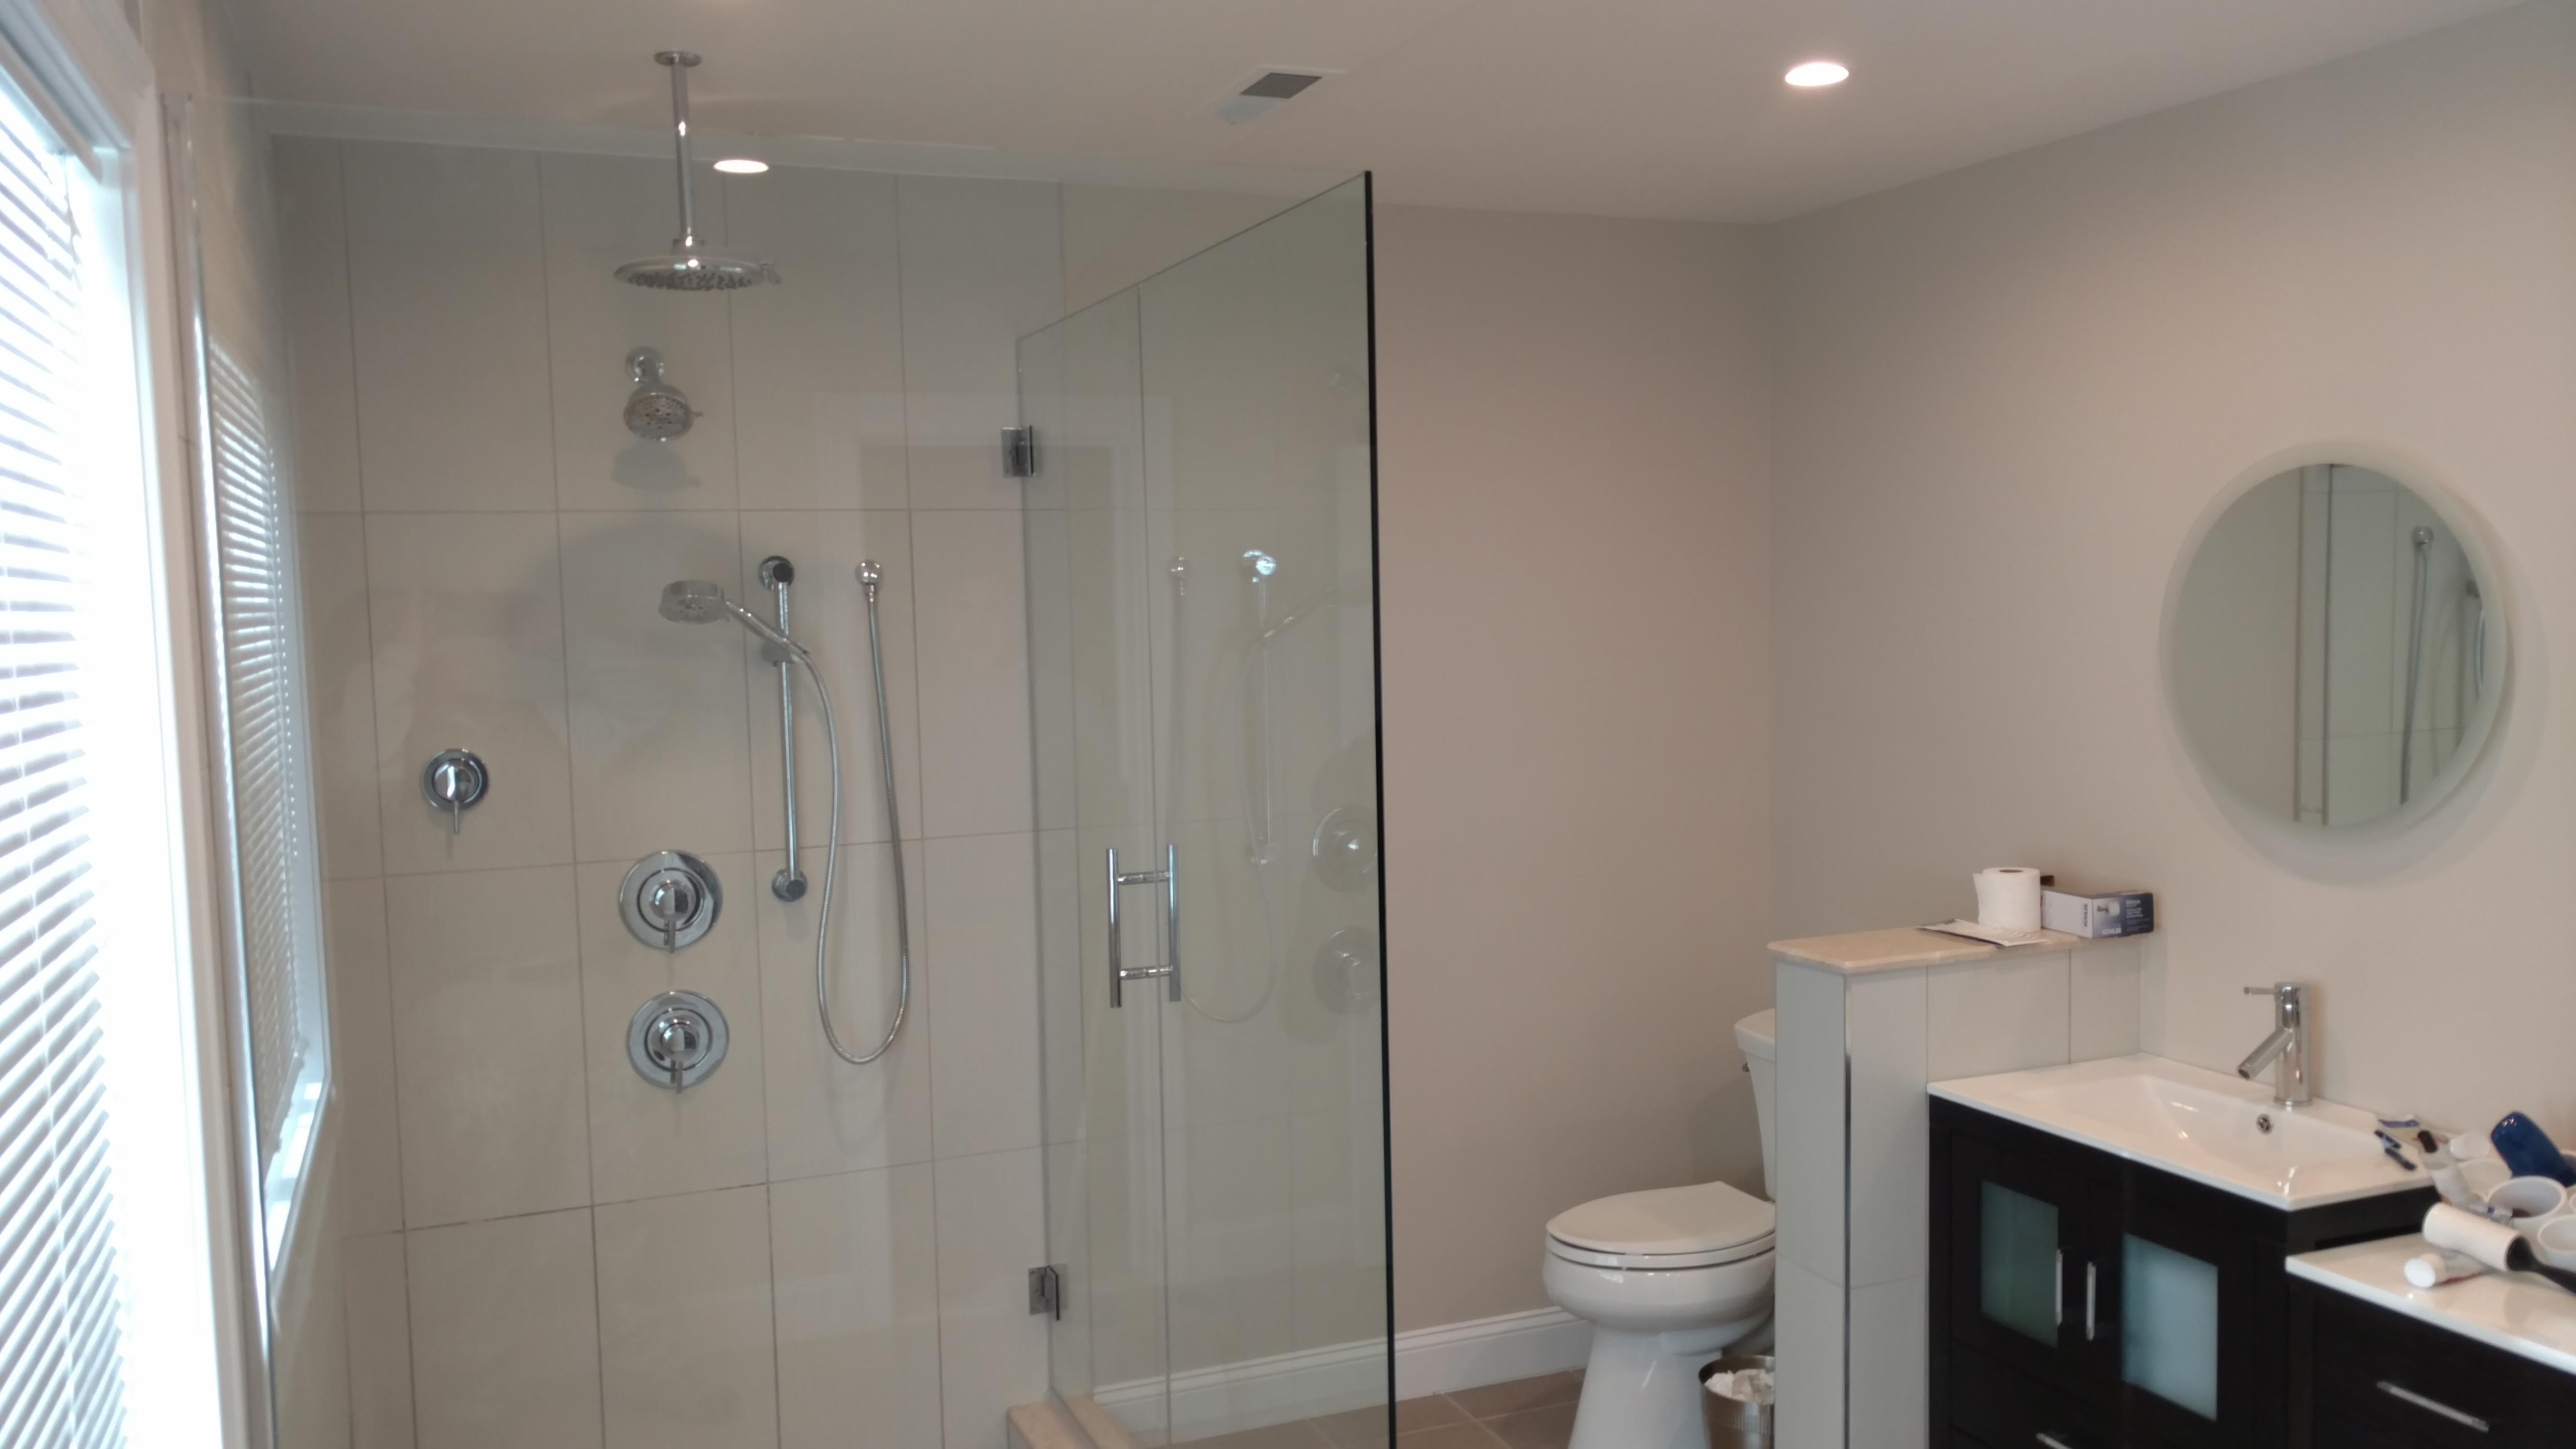 bathroom remodeling Milford CT | Alan Dinsmoor Contracting